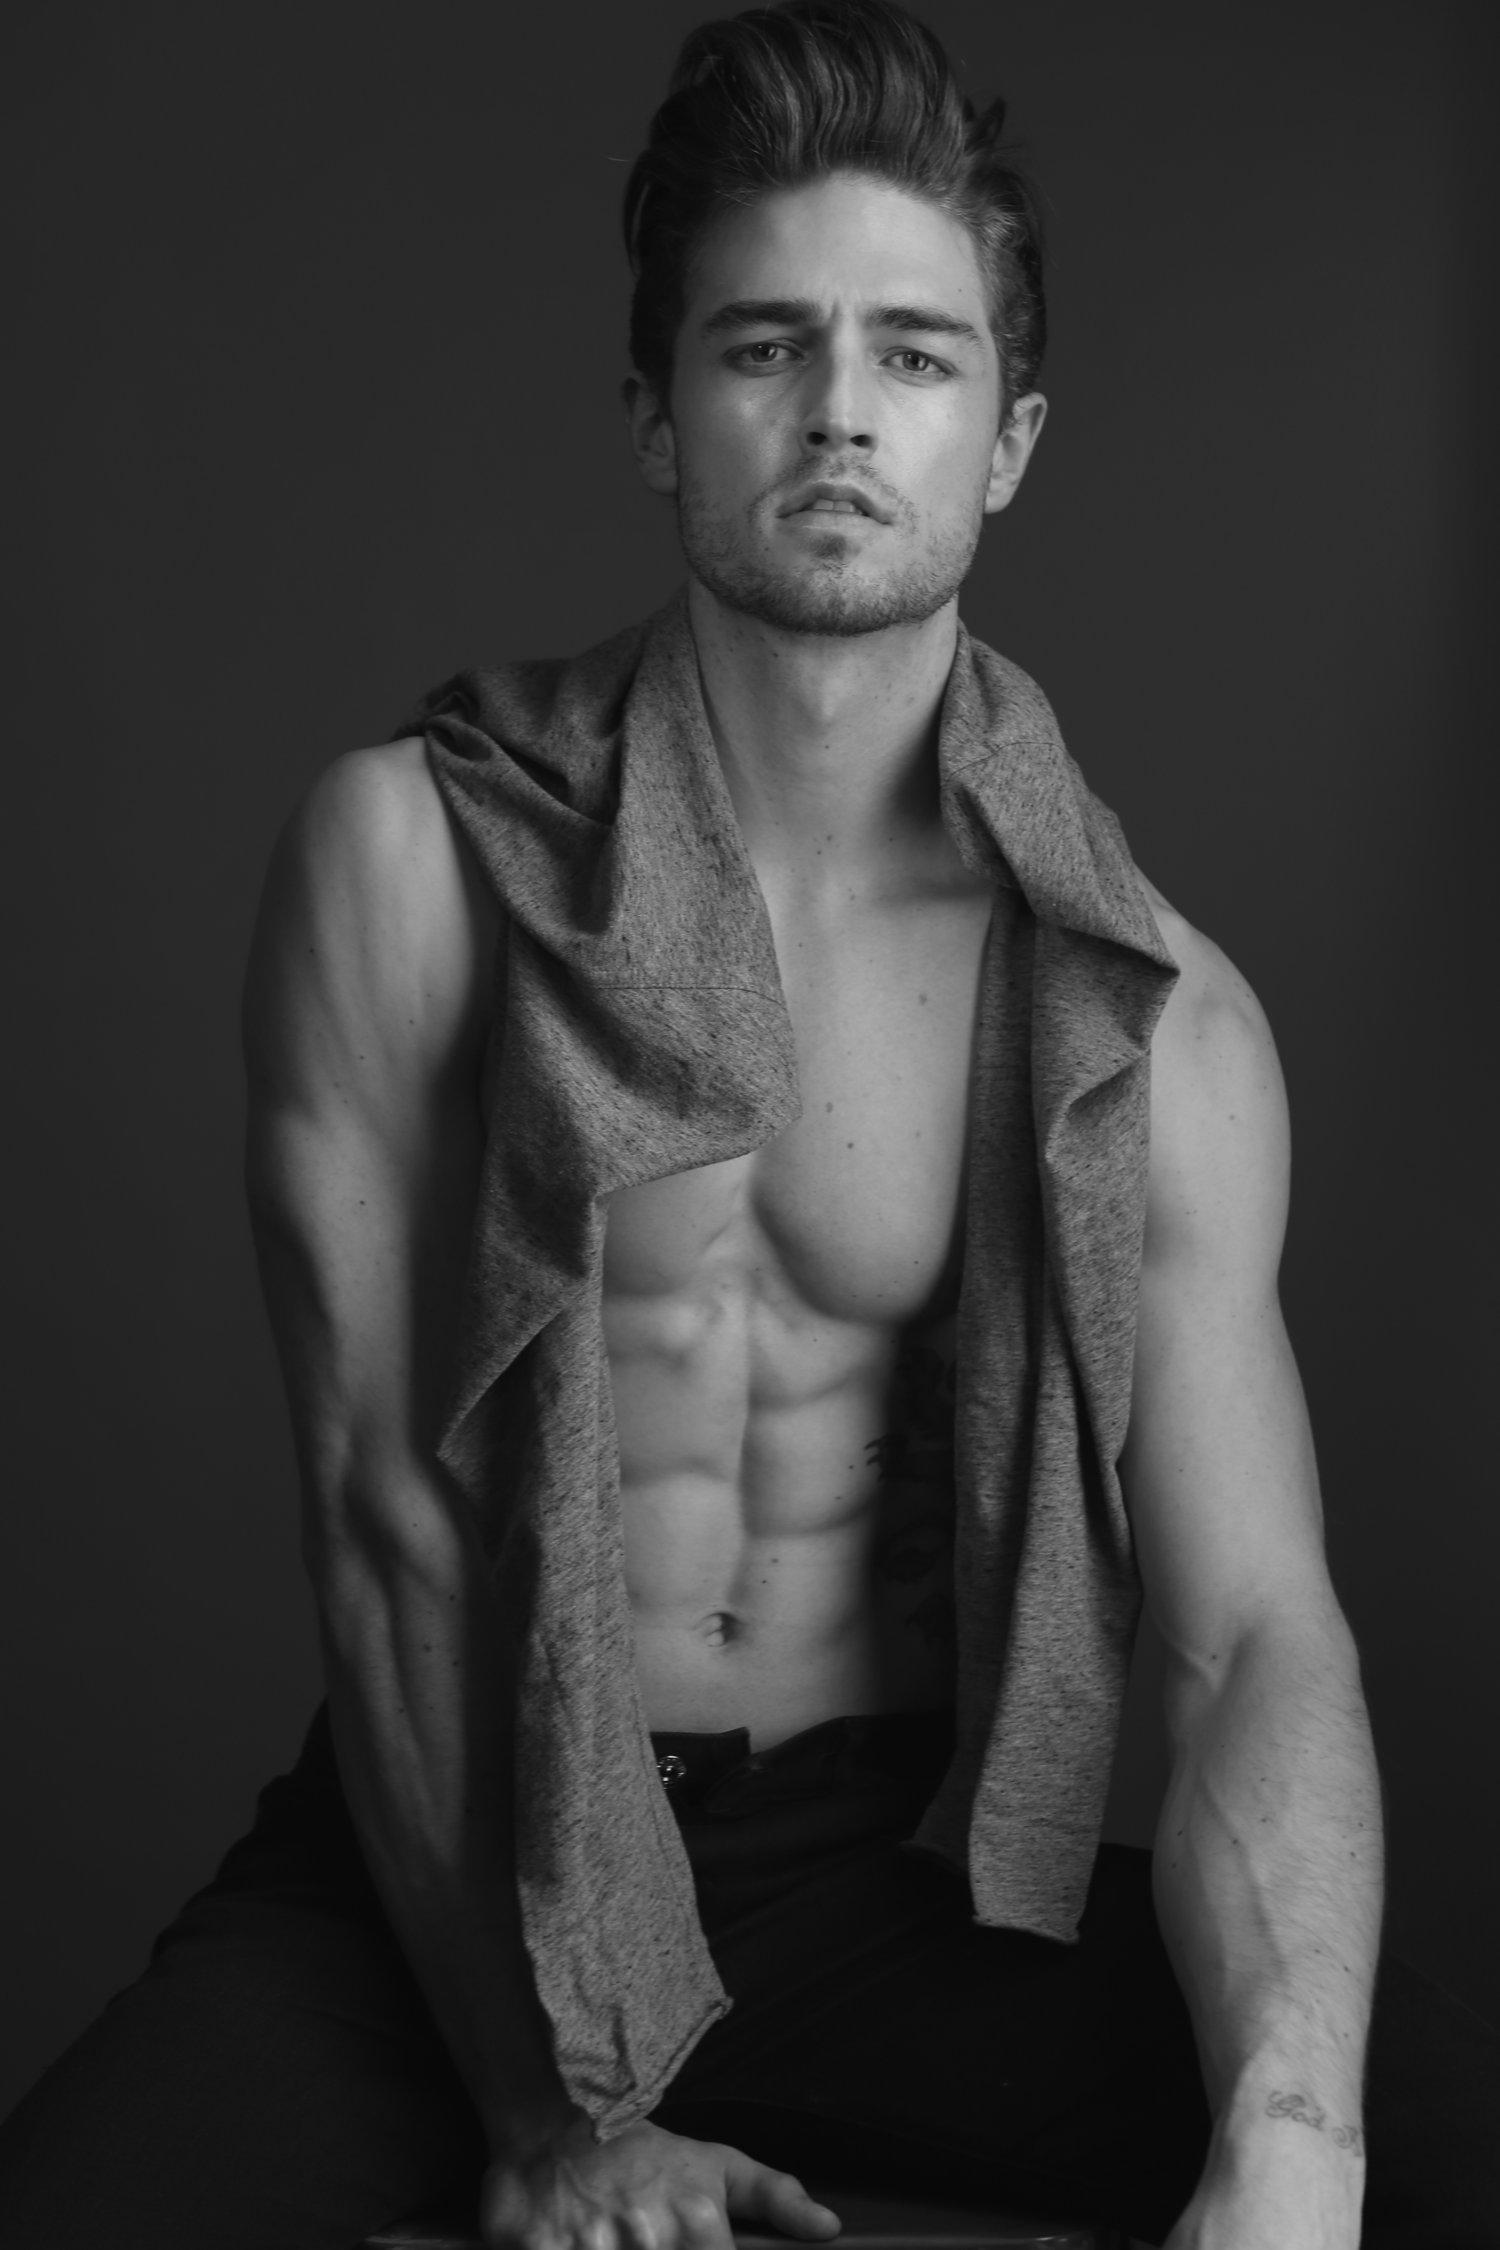 Adon Exclusive: Model JD Wren By Michael Dar